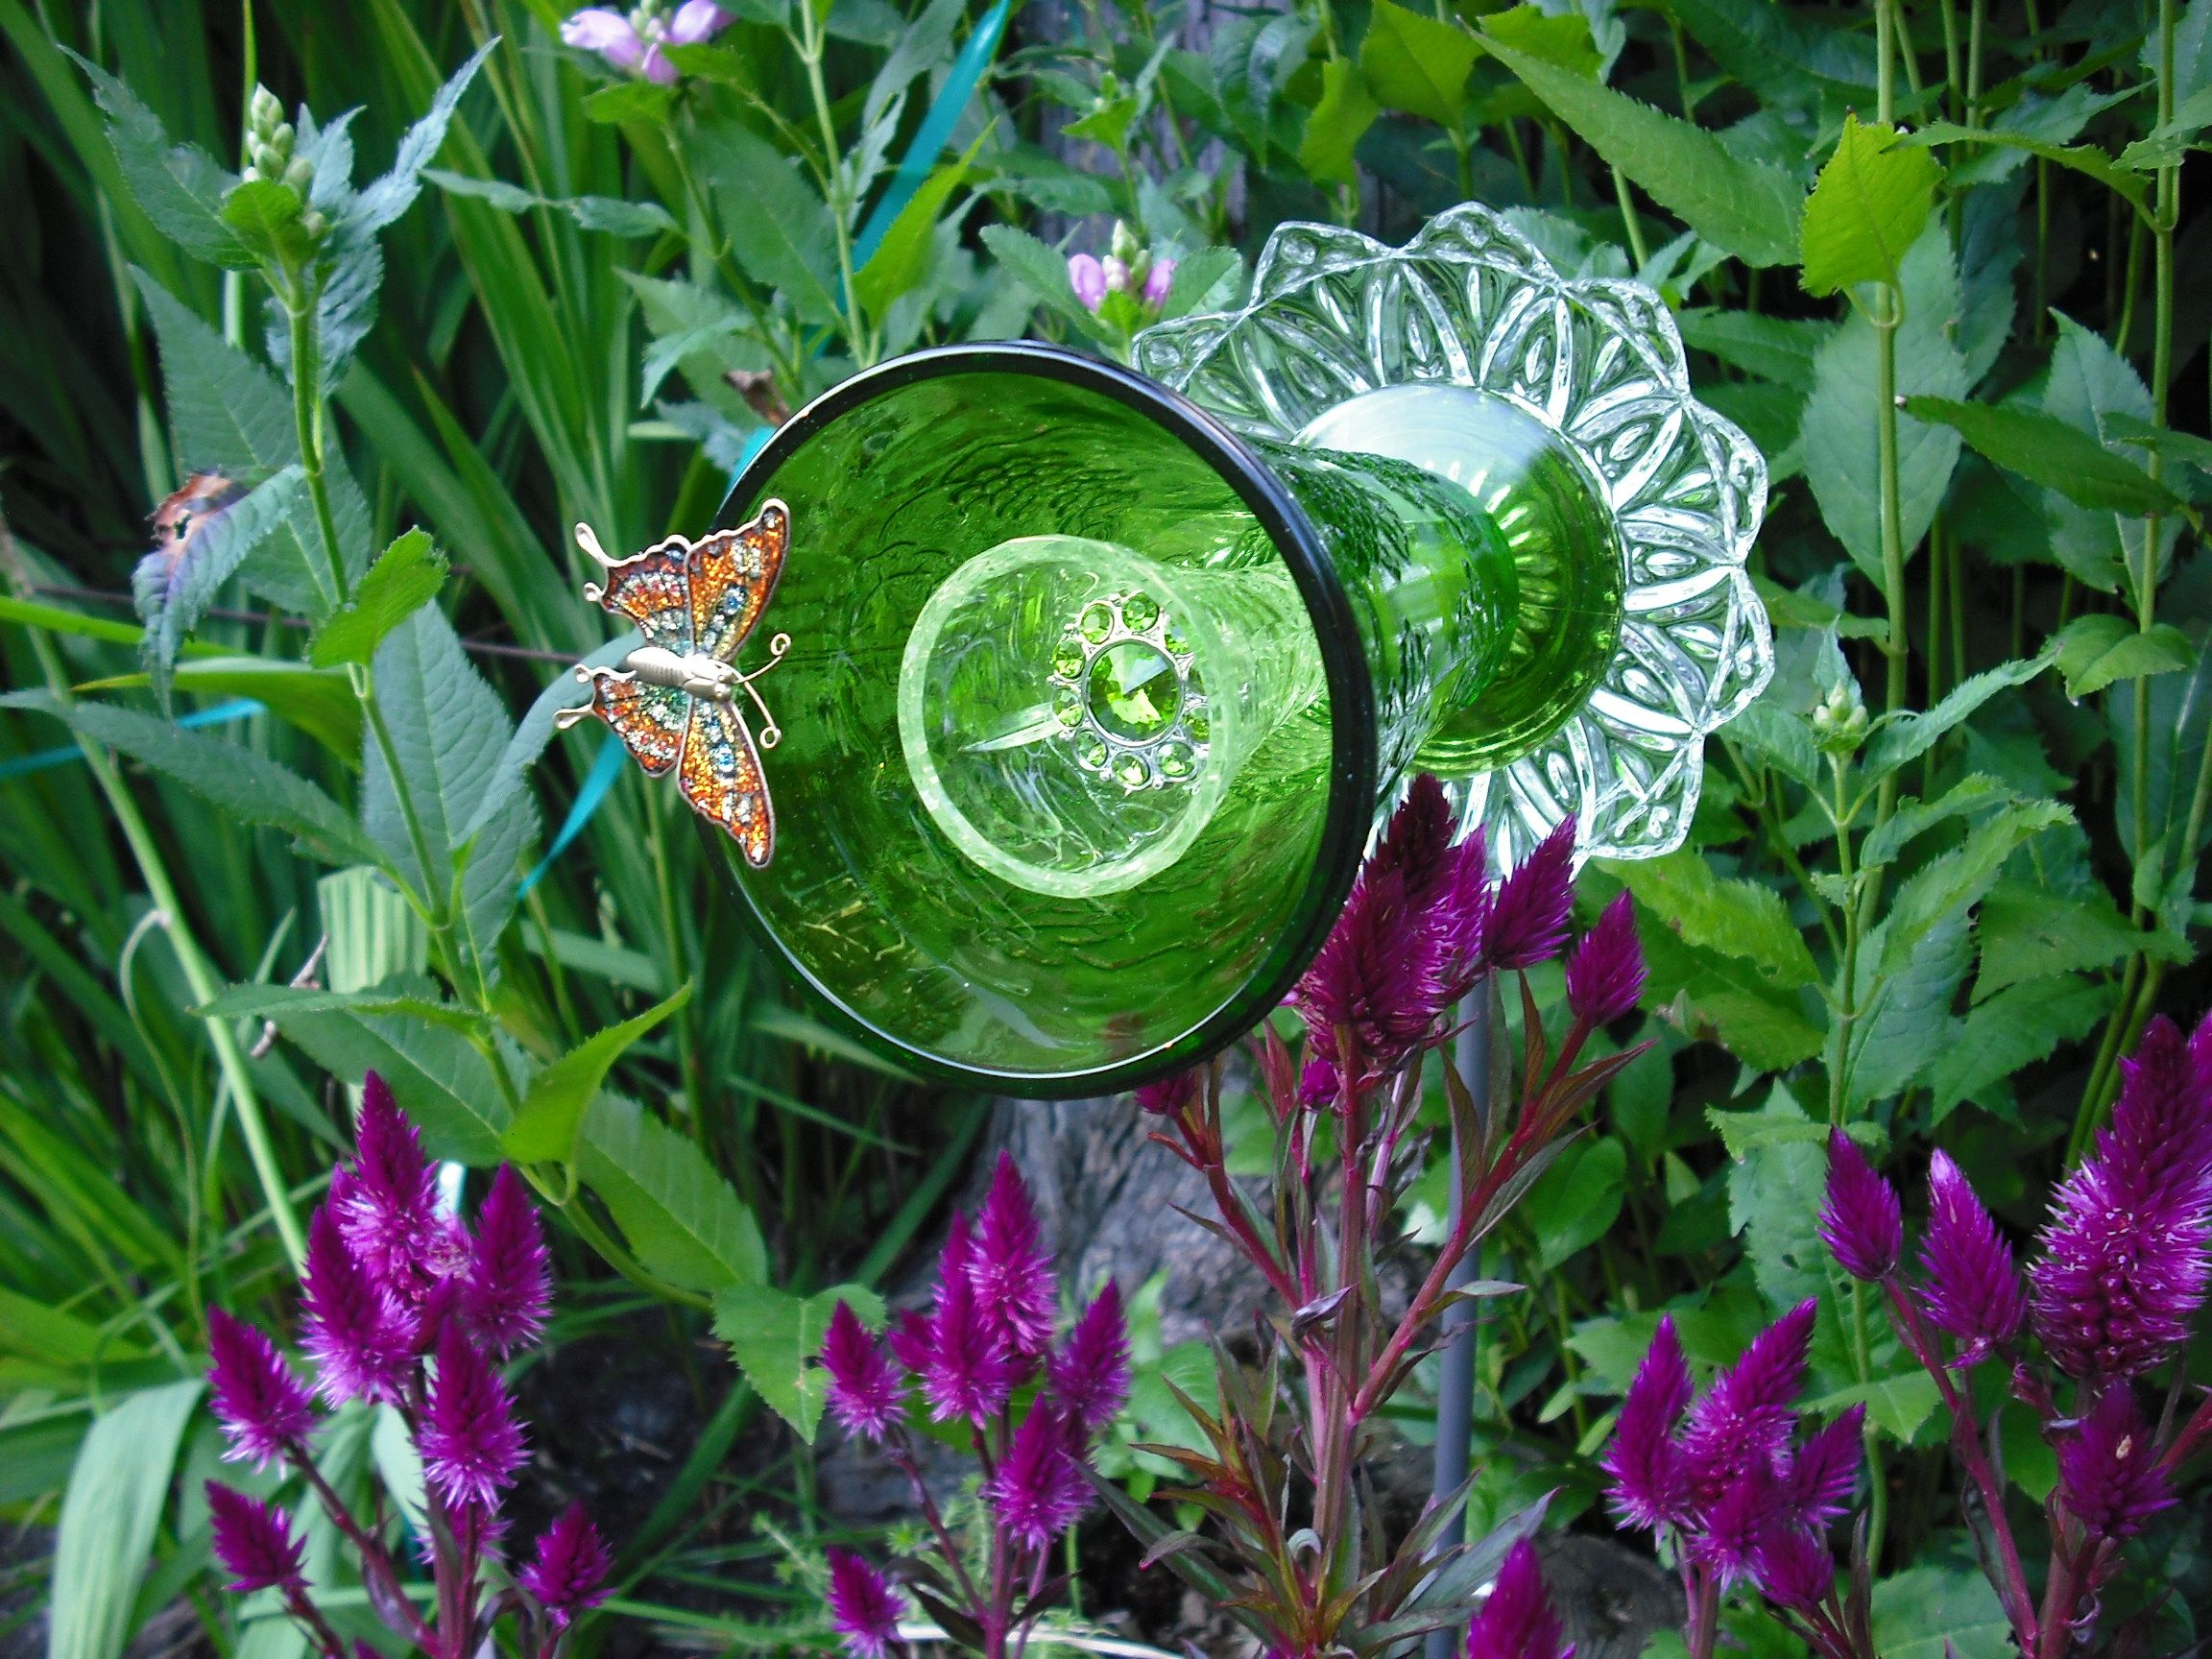 Green vase butterfly garden art | Veg garden | Pinterest | Garden ...